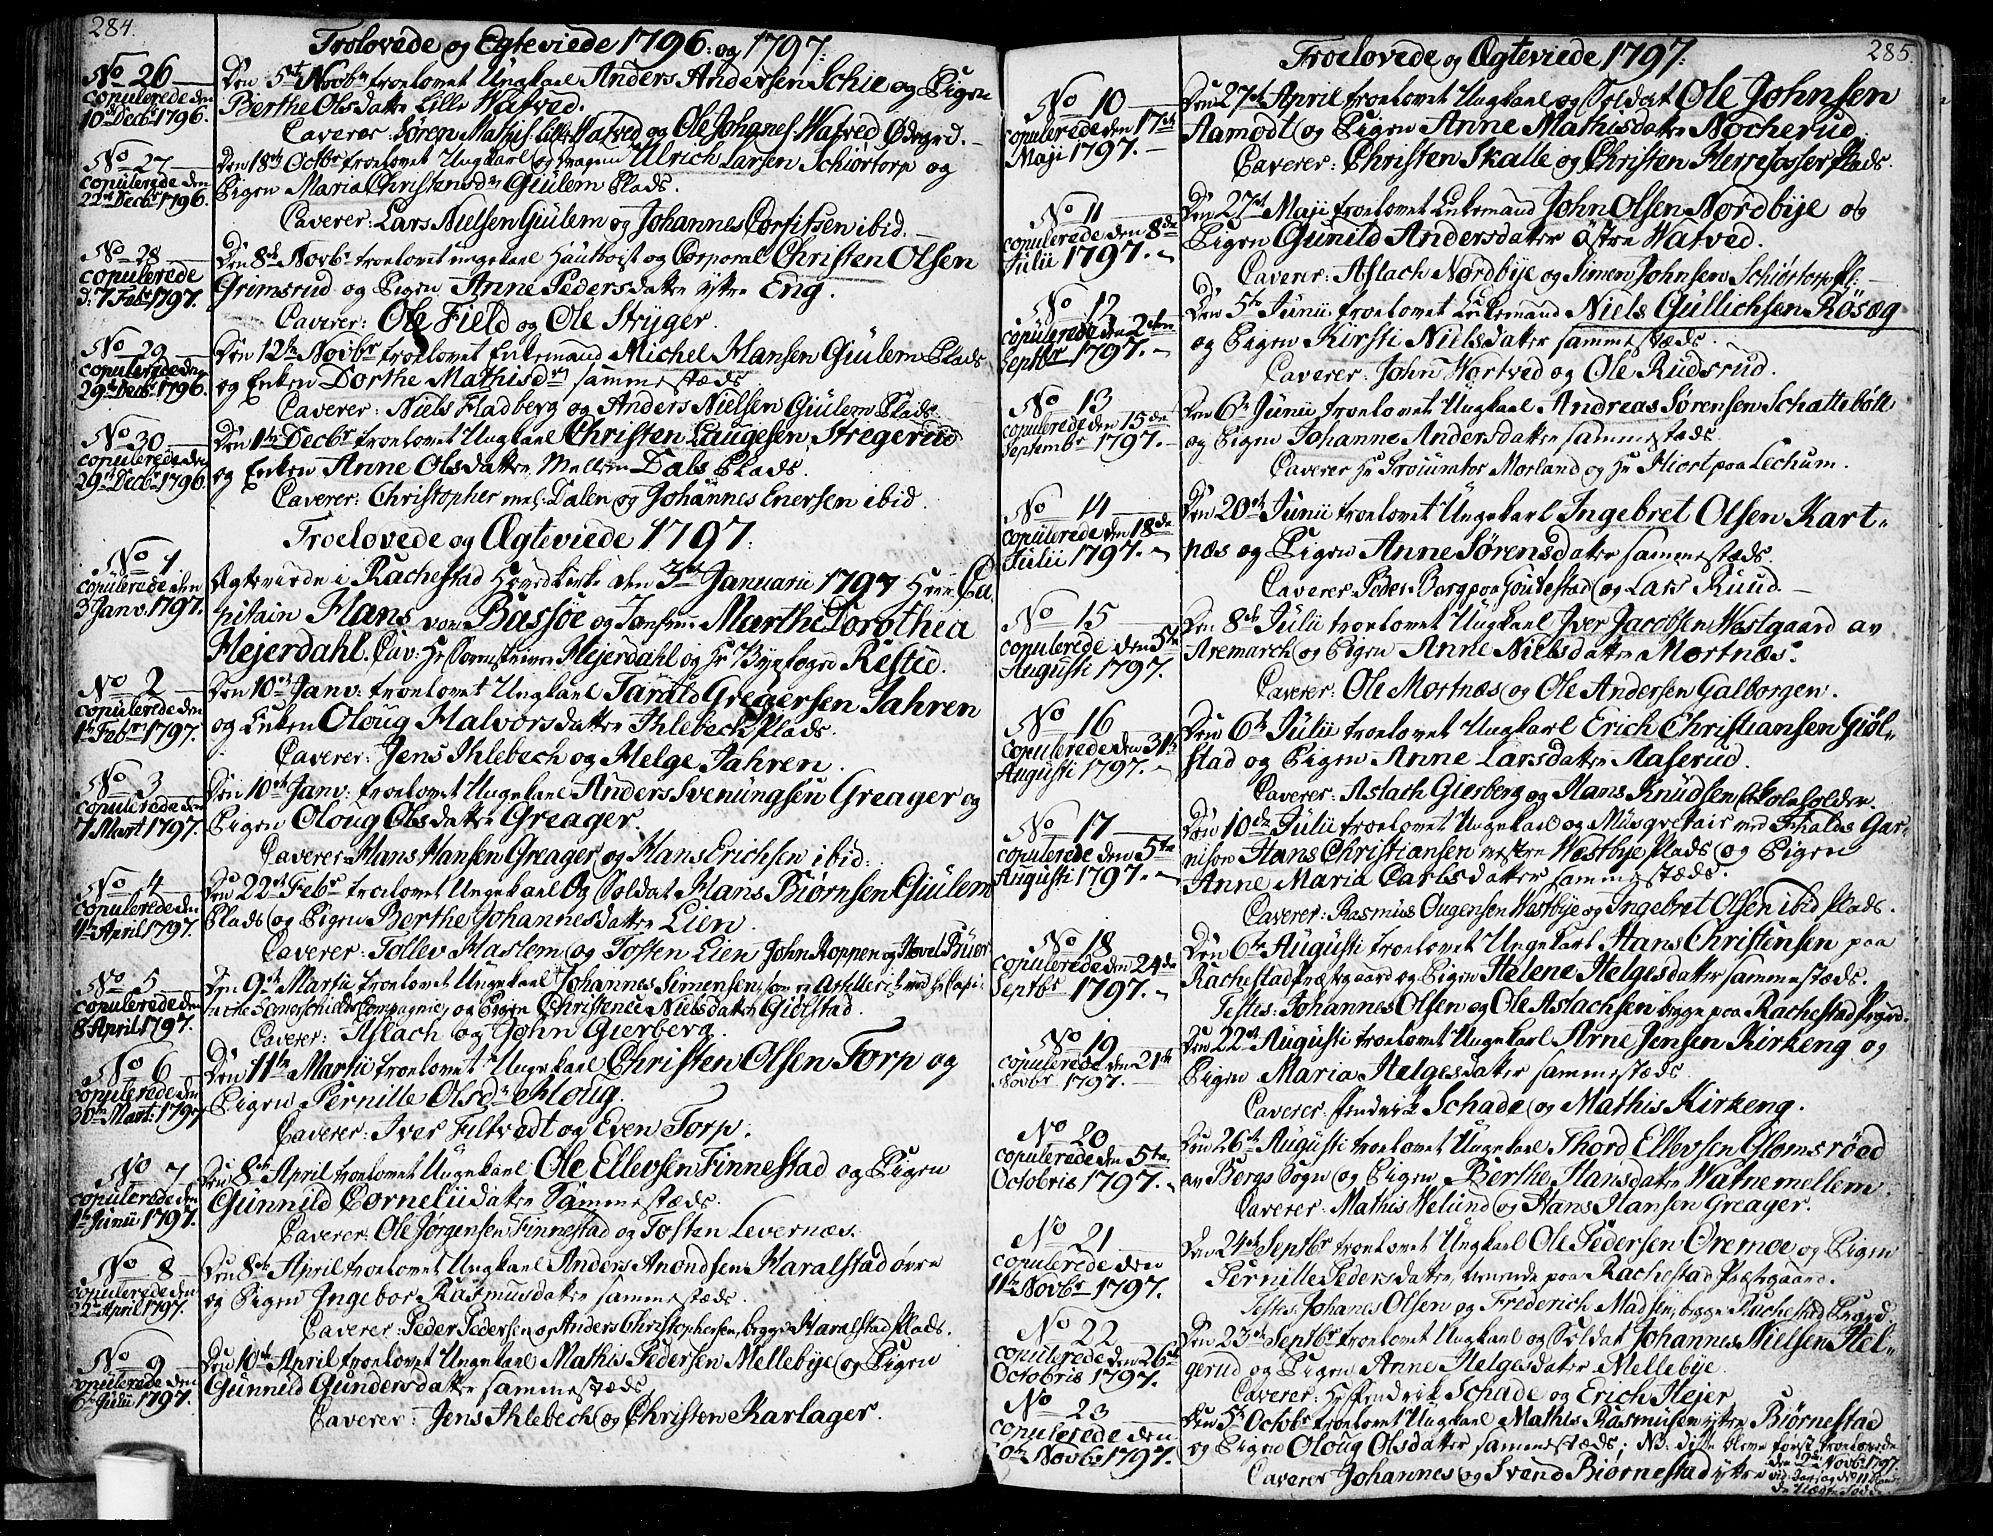 SAO, Rakkestad prestekontor Kirkebøker, F/Fa/L0005: Ministerialbok nr. I 5, 1784-1814, s. 284-285